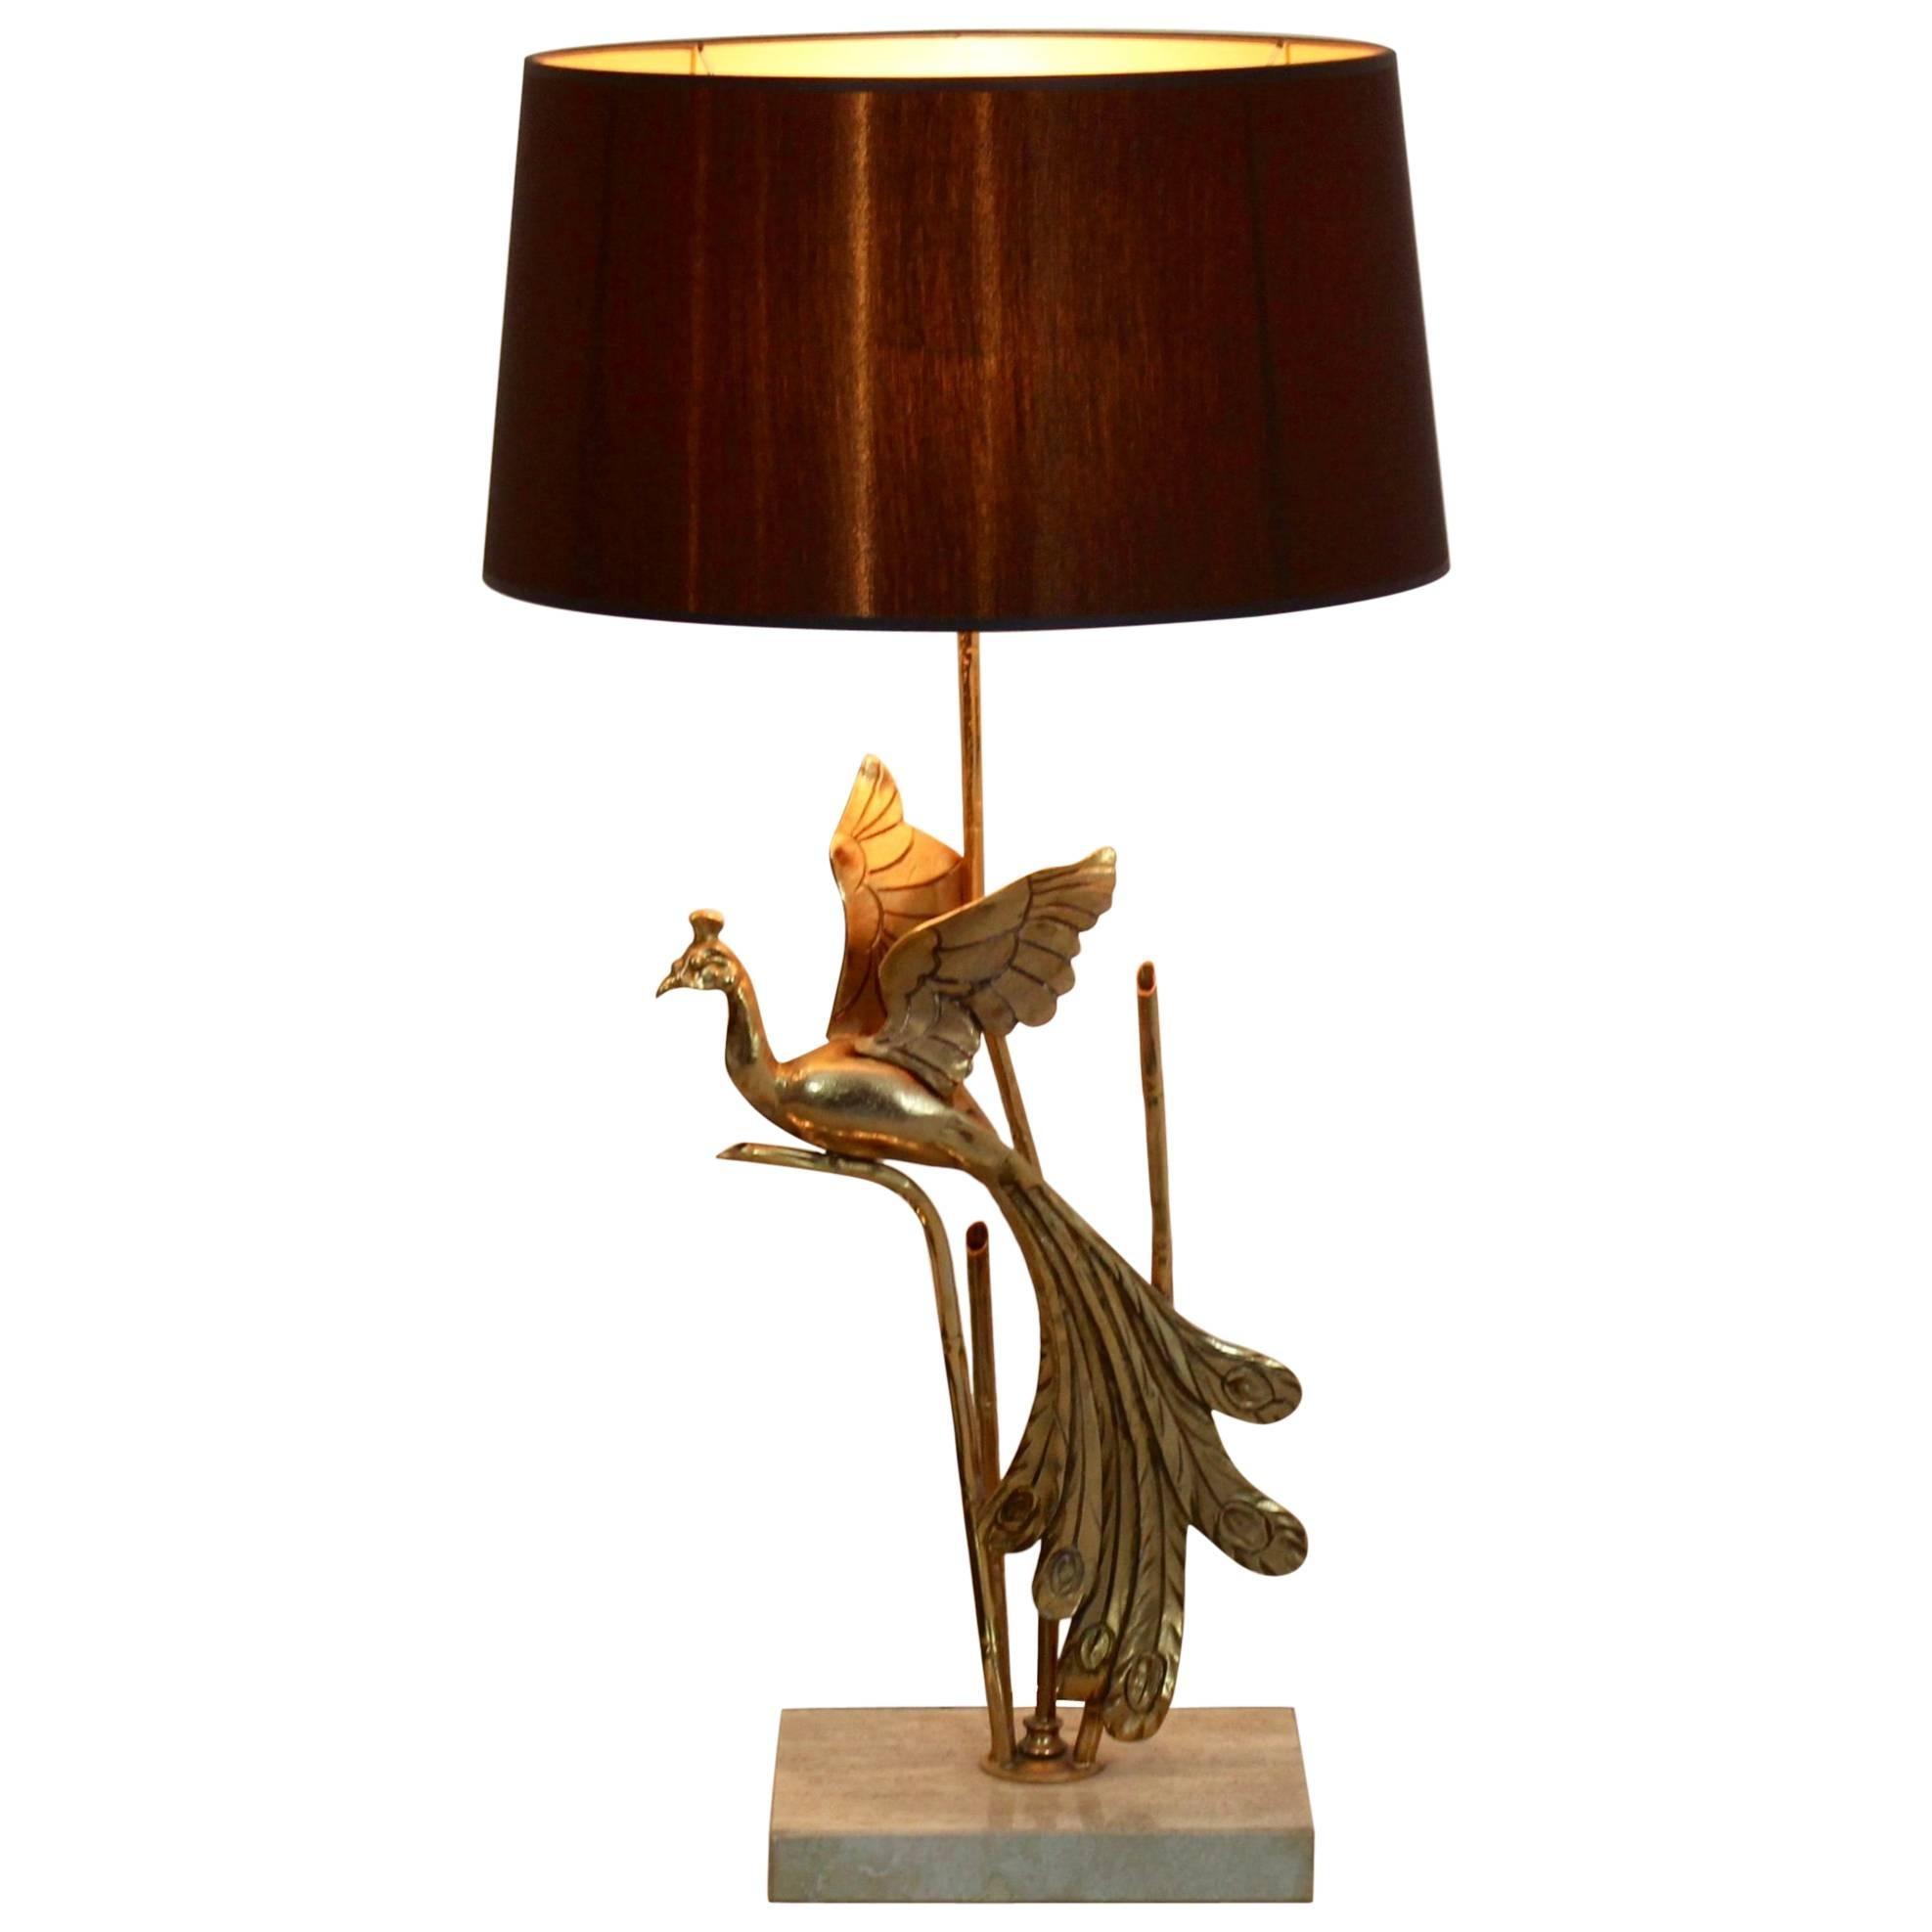 Sculptural Gilt Metal on Travertine Peacock Table Lamp or Floor Lamp, 1970s